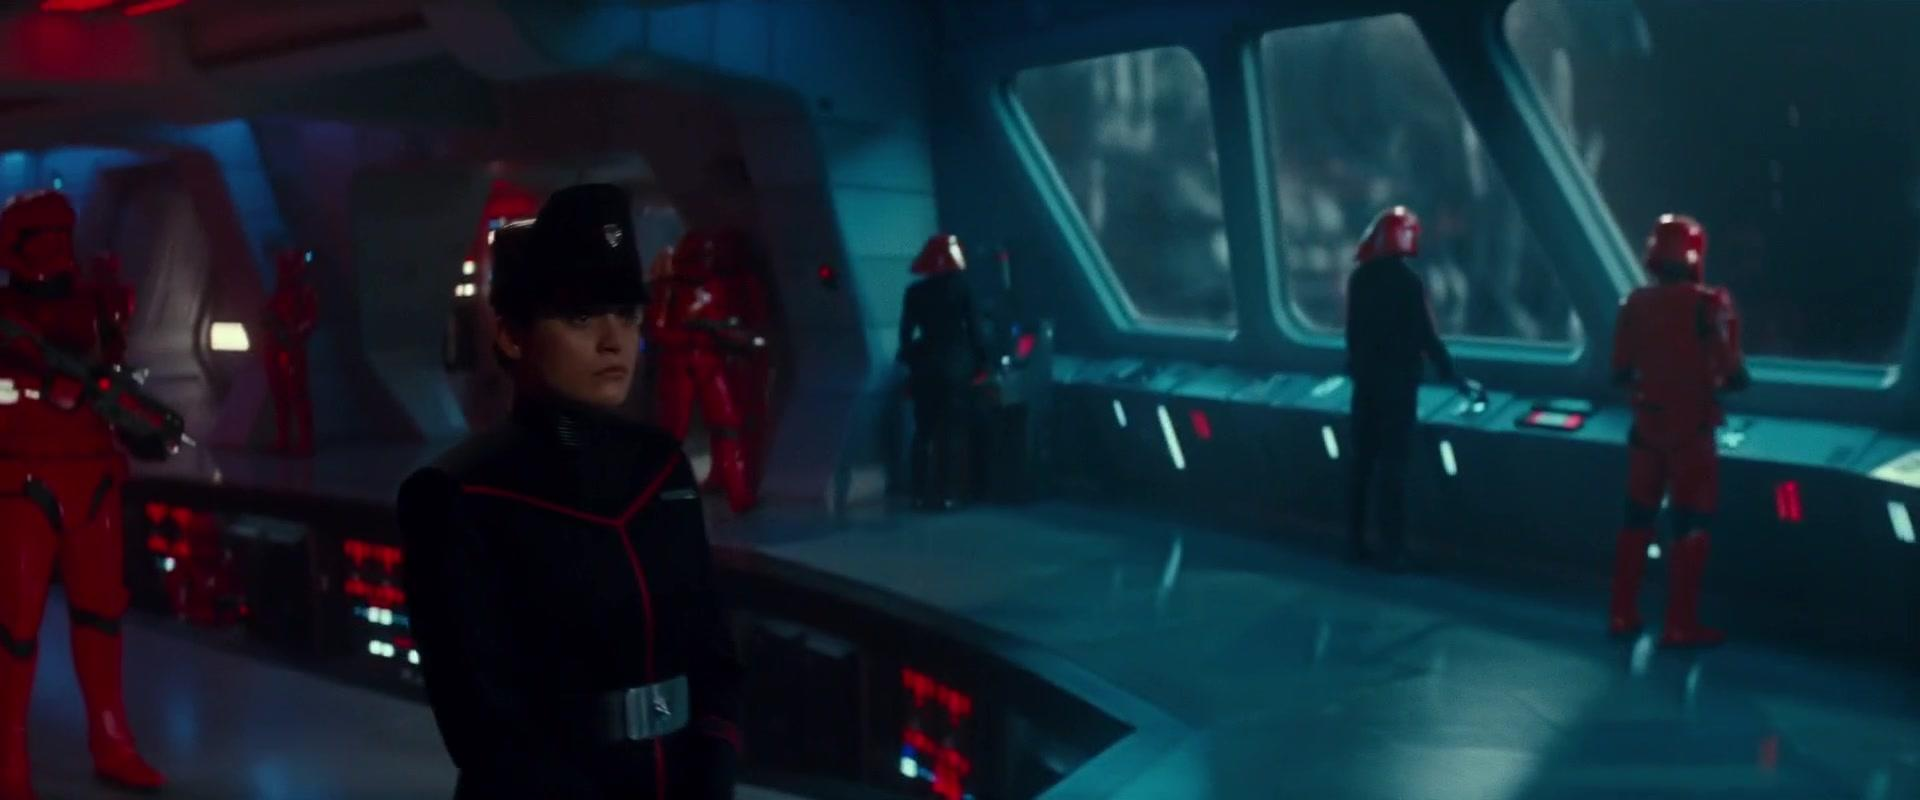 Star Wars Episode IX The Rise of Skywalker 2020 1080p BDRip X264 AC3-EVO